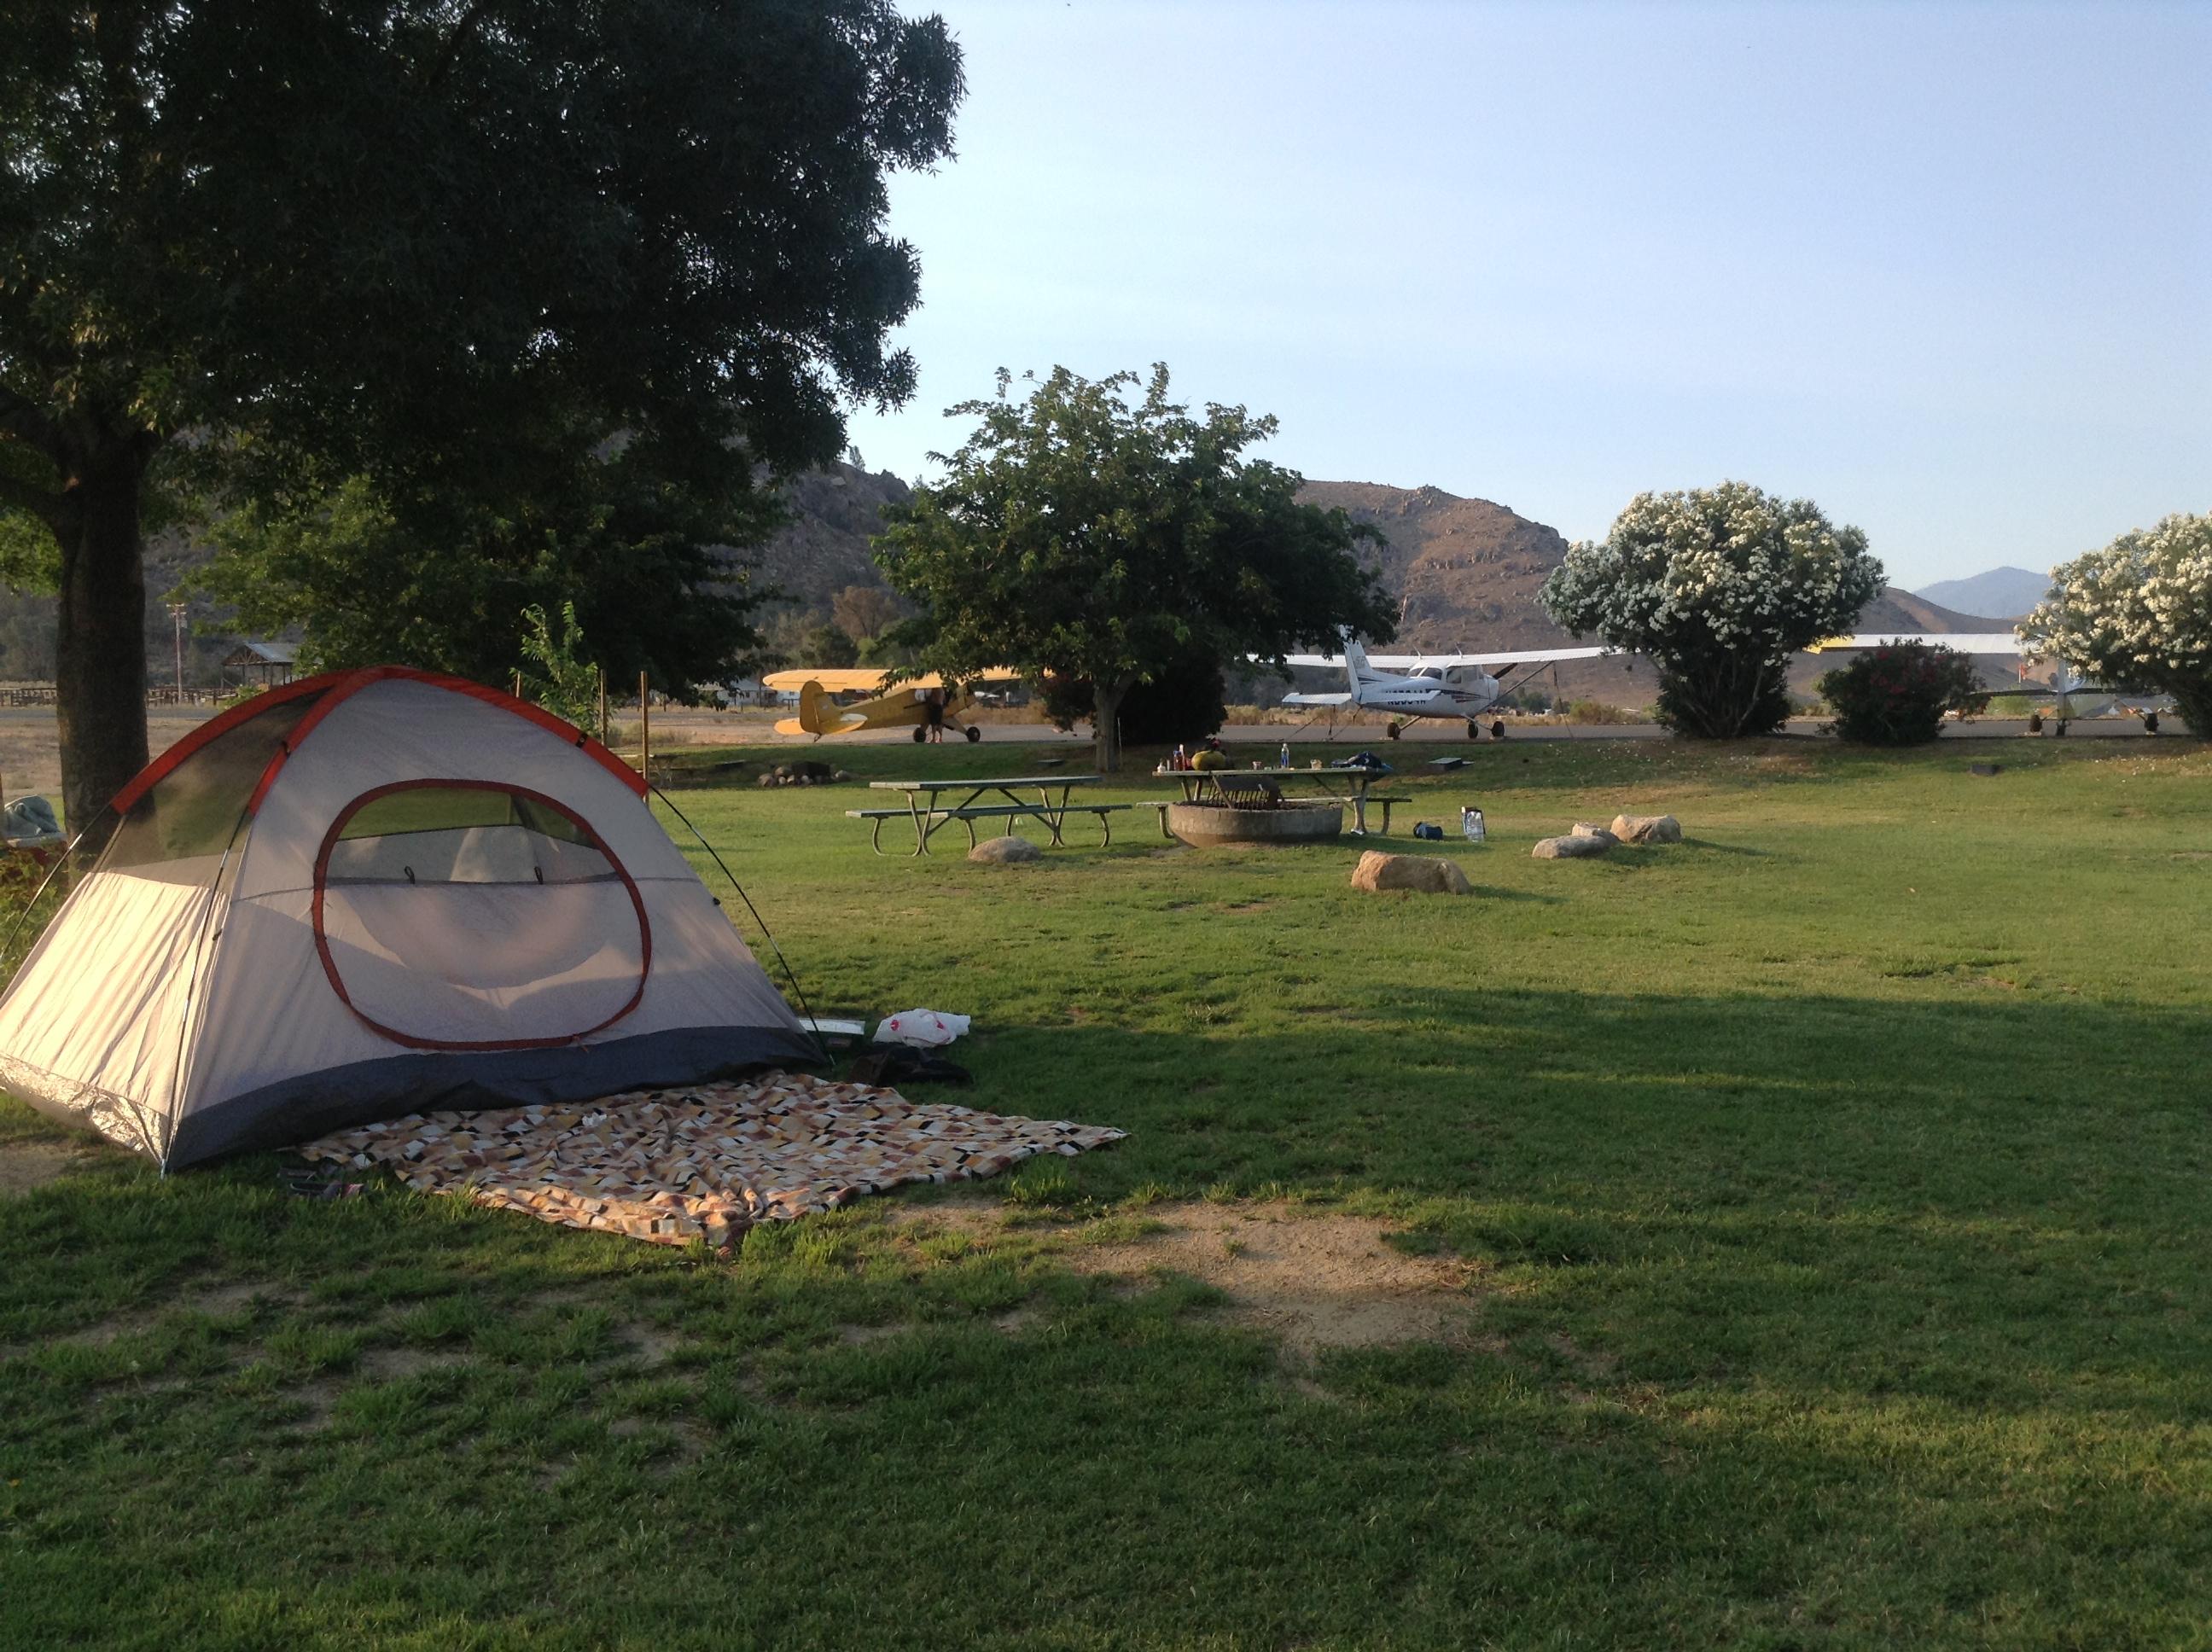 Airplane Camping at Kern Valley